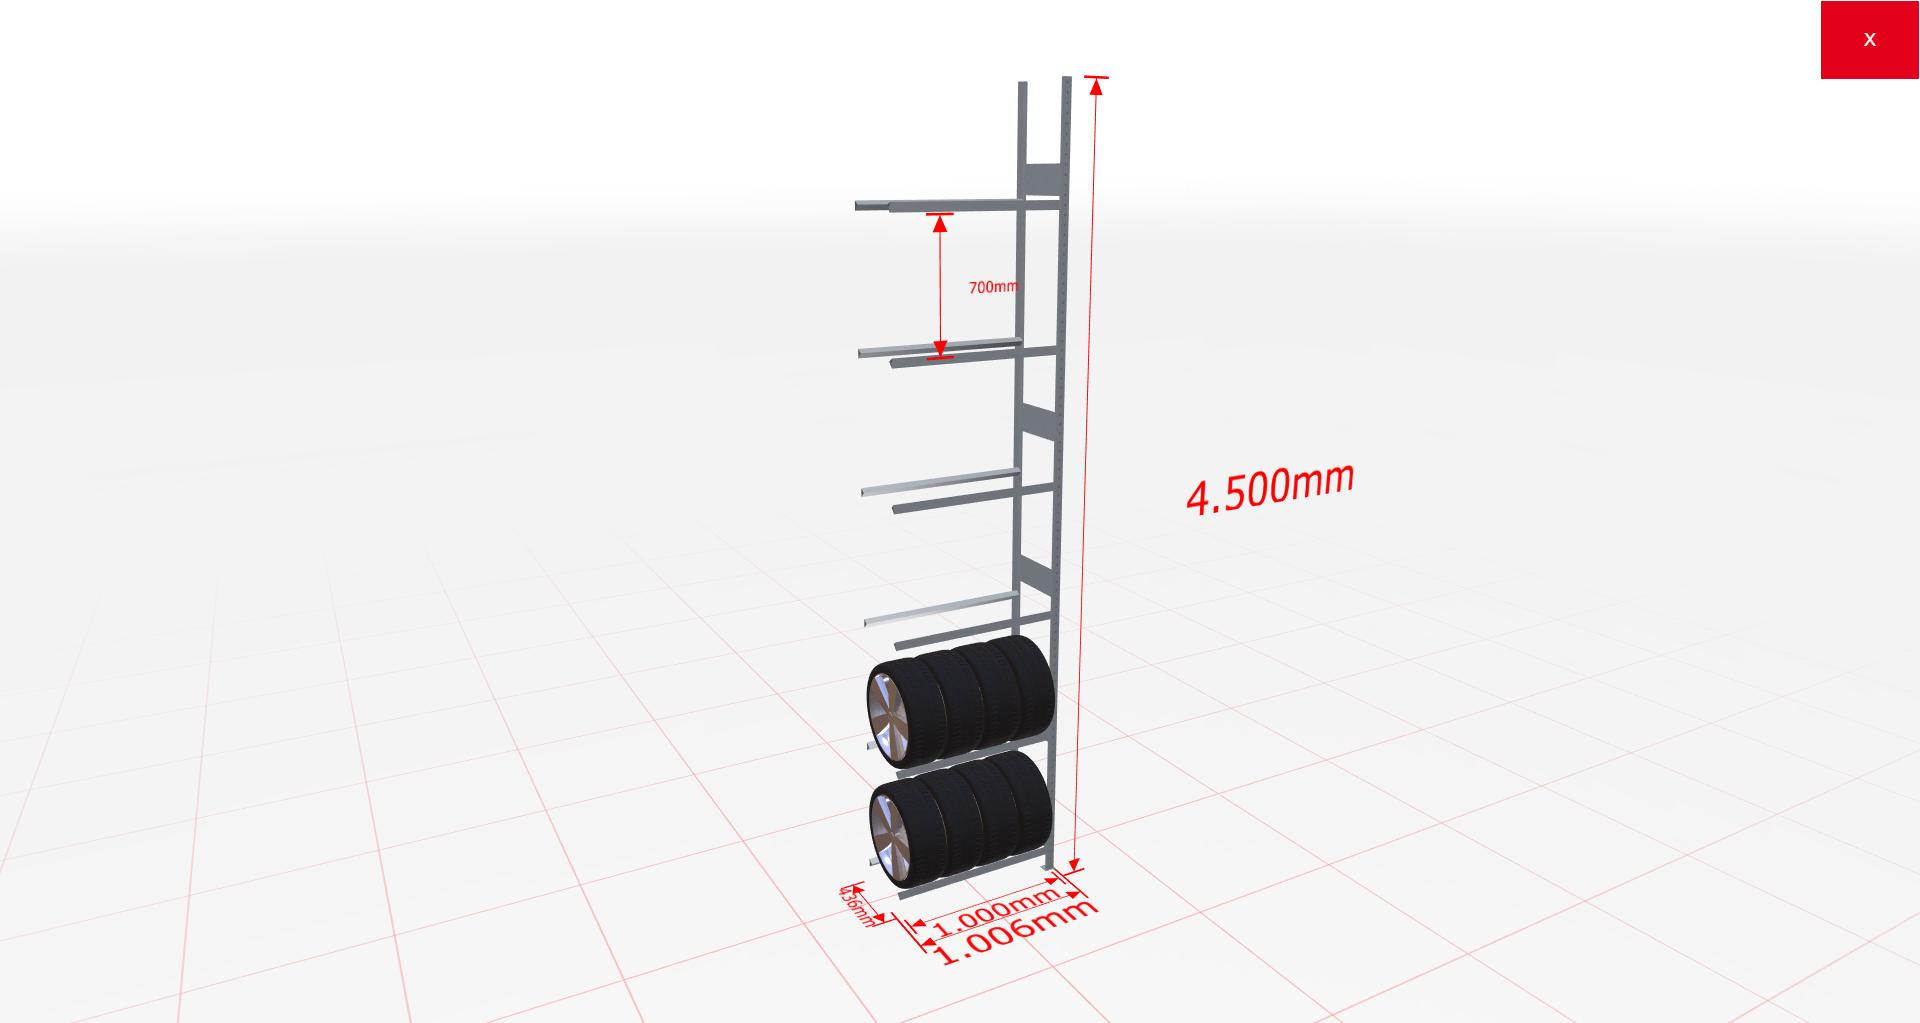 Räderregal Anbauregal SCHULTE Lagertechnik 4500x1000x400 mm – 6 Ebenen á 1000 mm, verzinkt